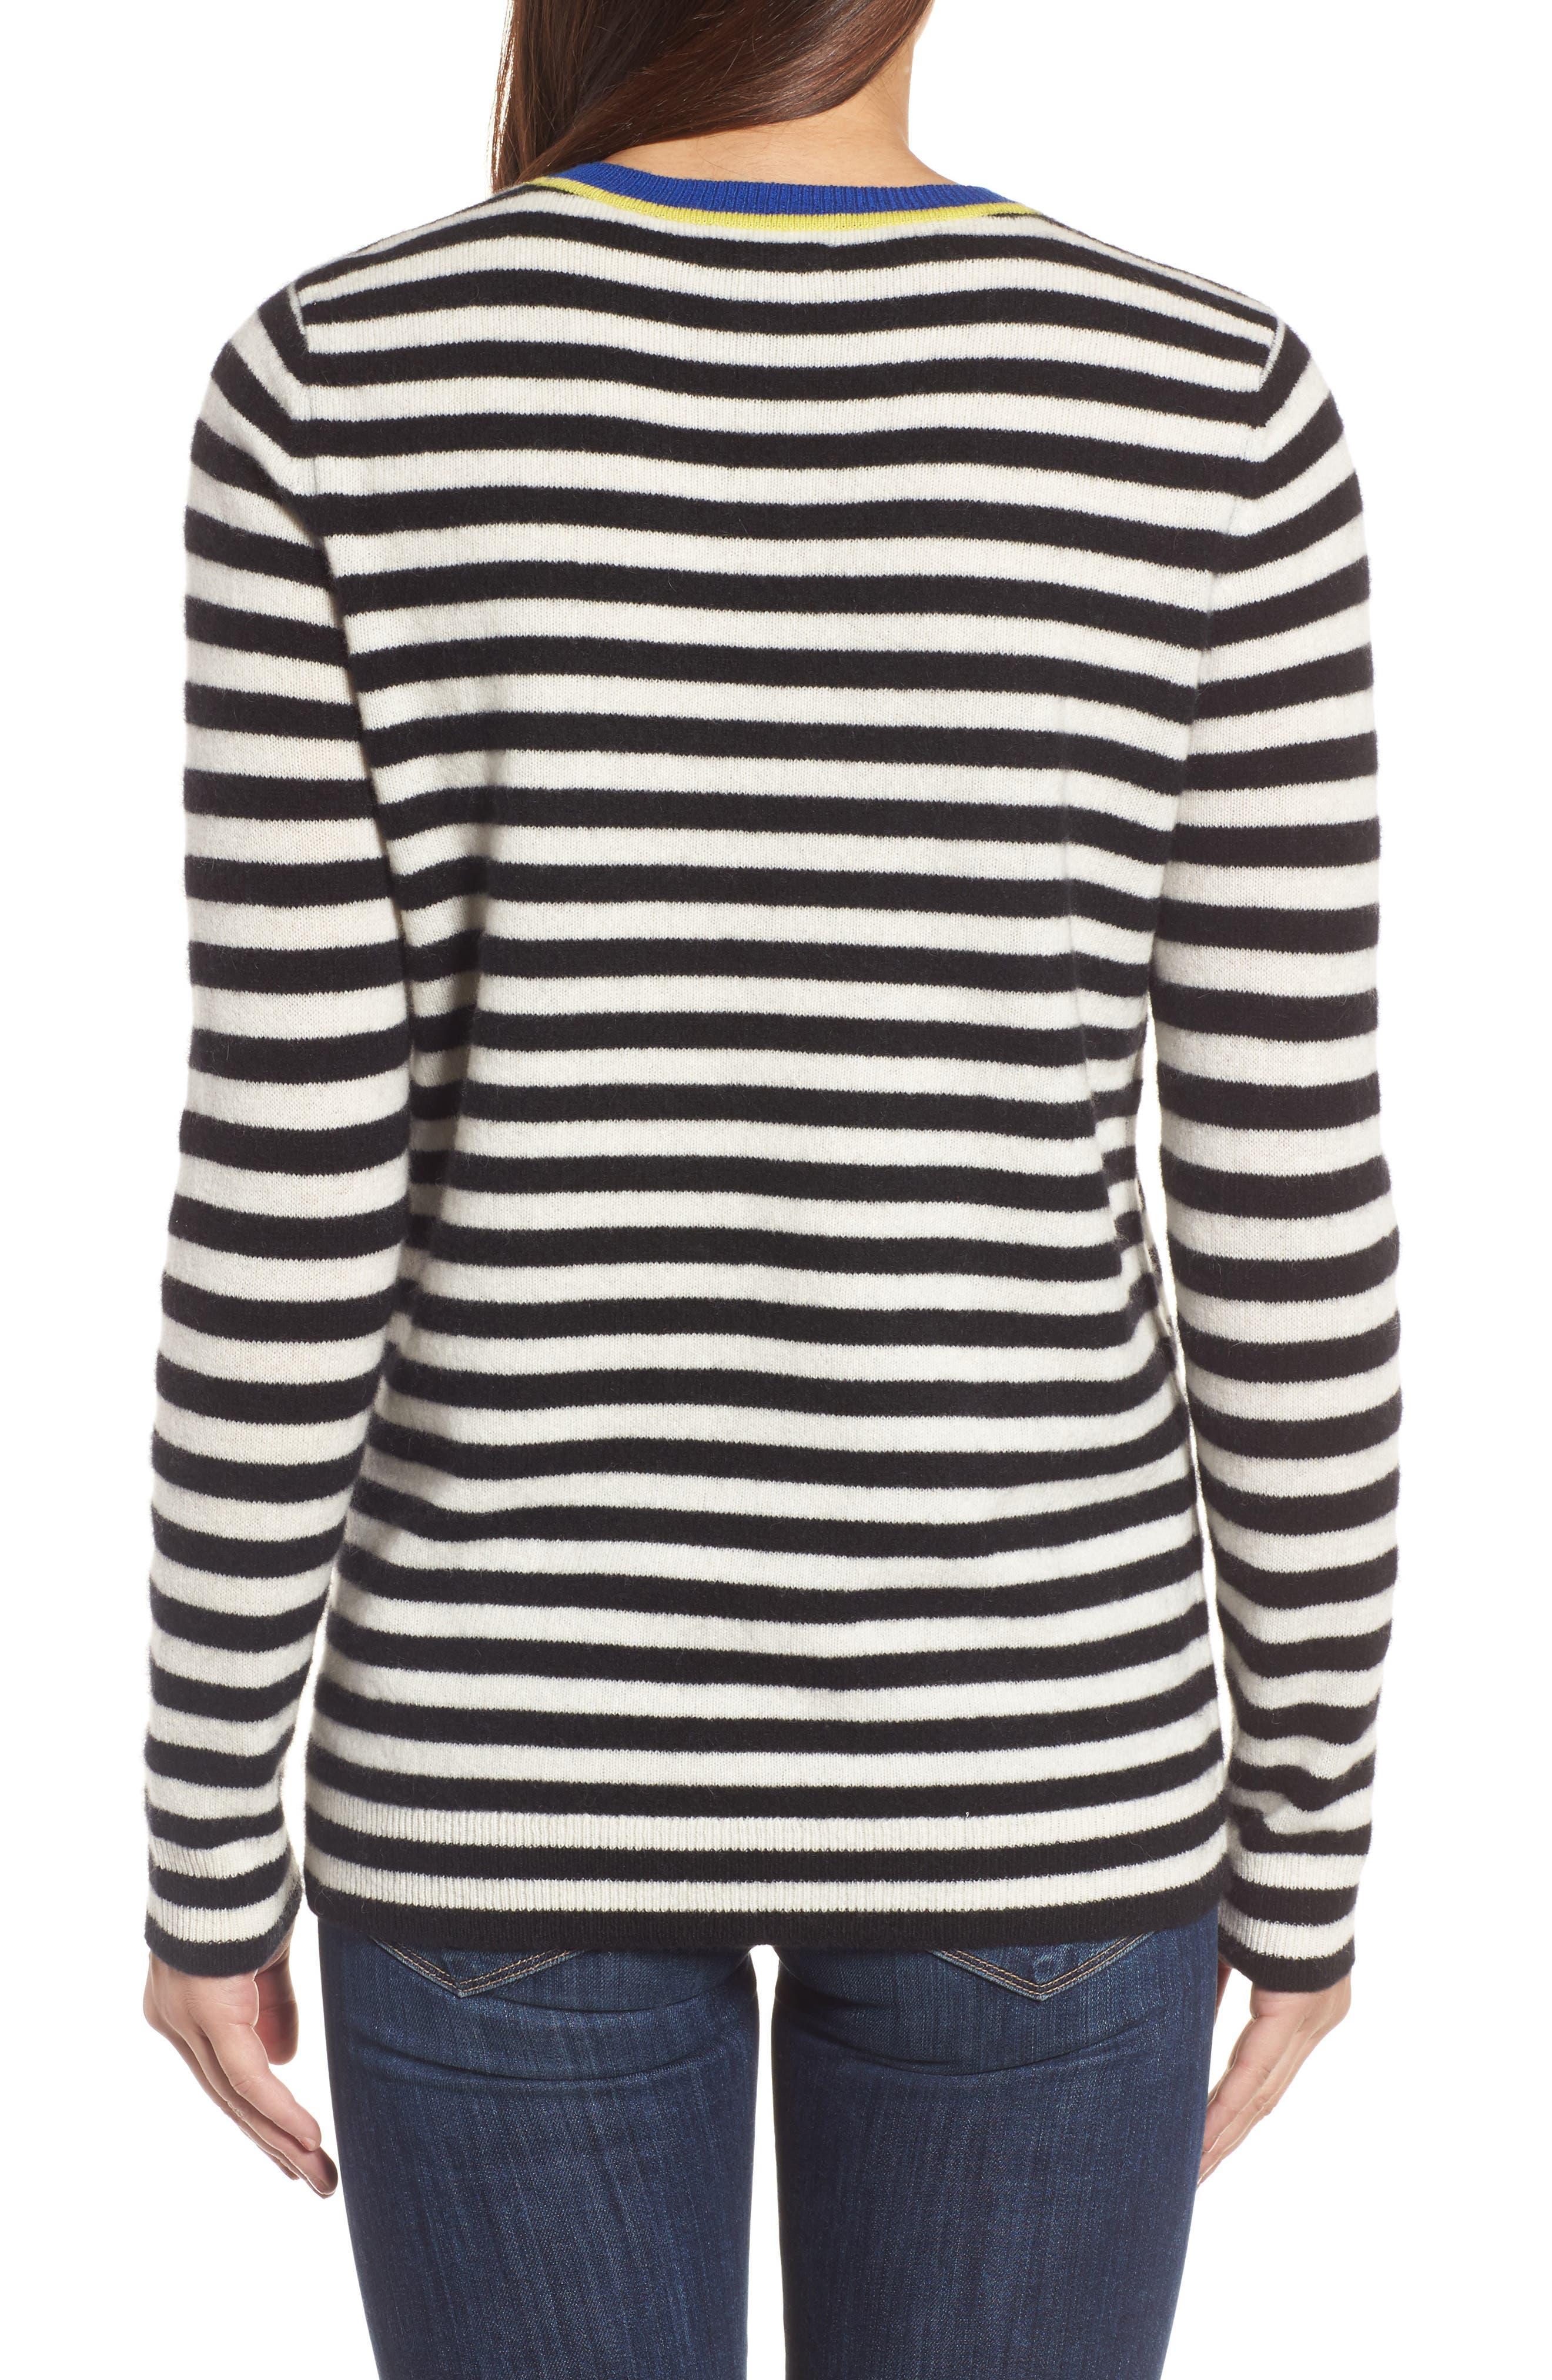 Stripe Cashmere Sweater,                             Alternate thumbnail 2, color,                             001